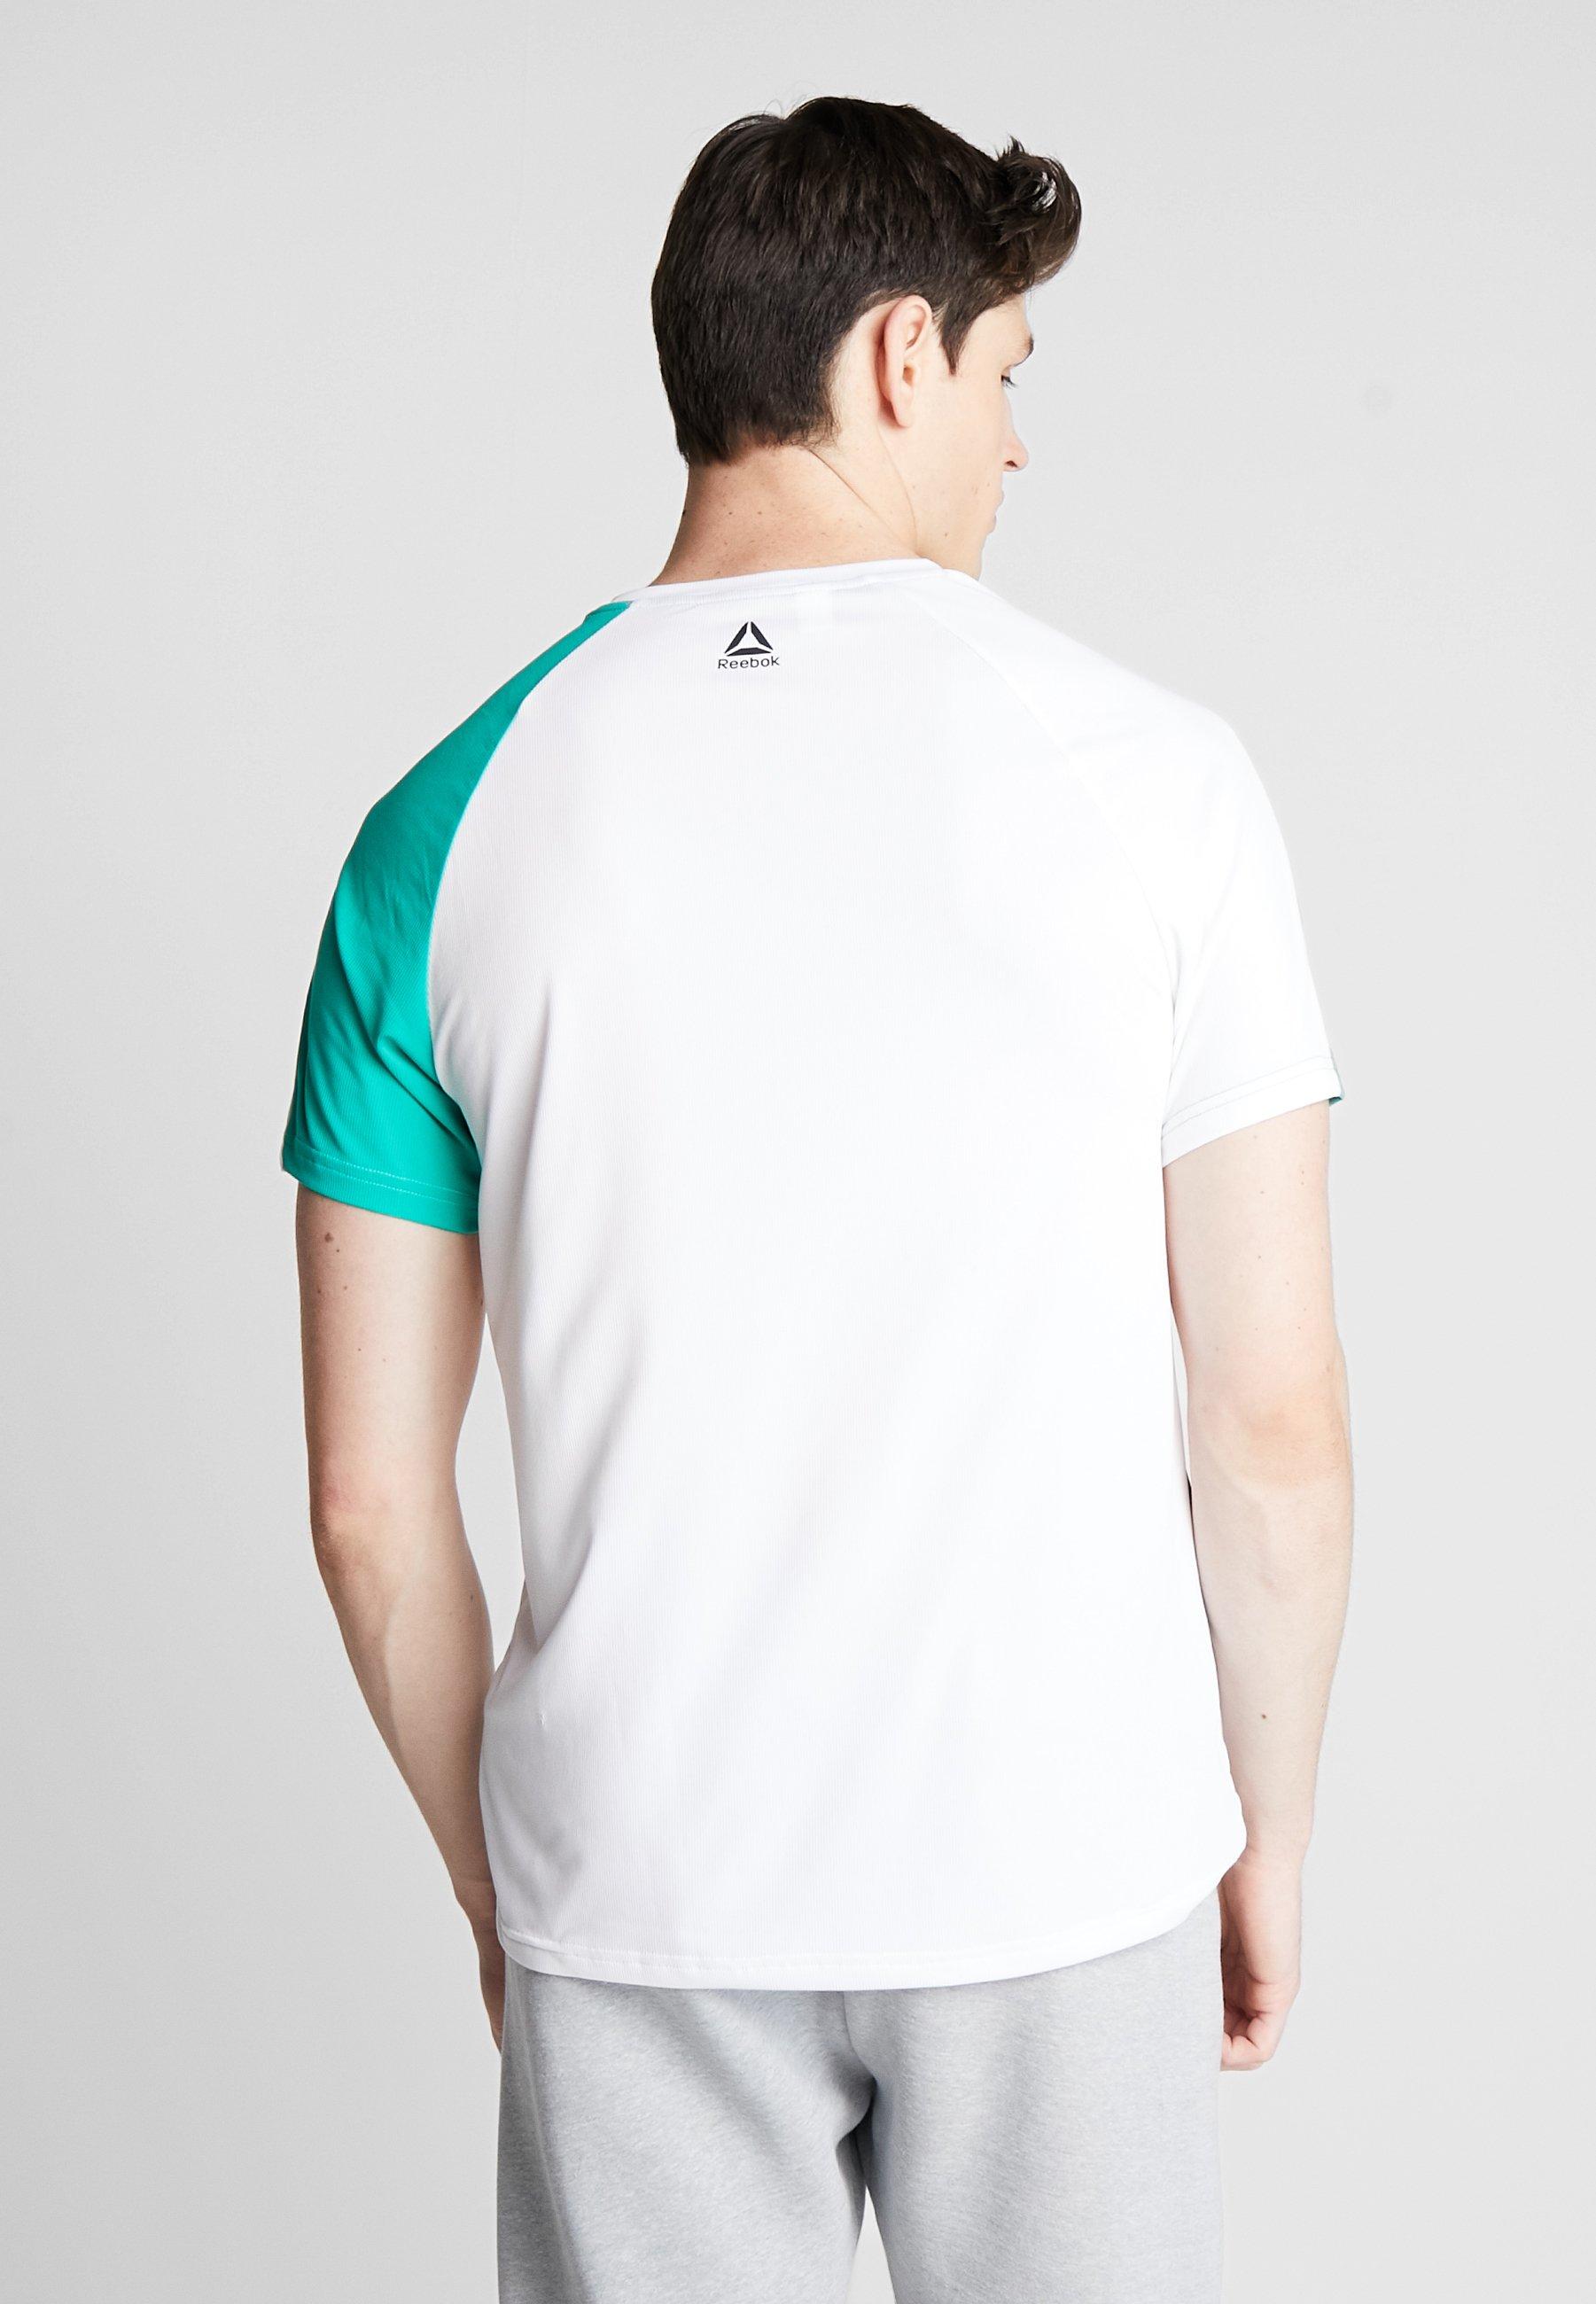 BLOCKED print TEET Reebok Shirt white OST hCrBotxsQd